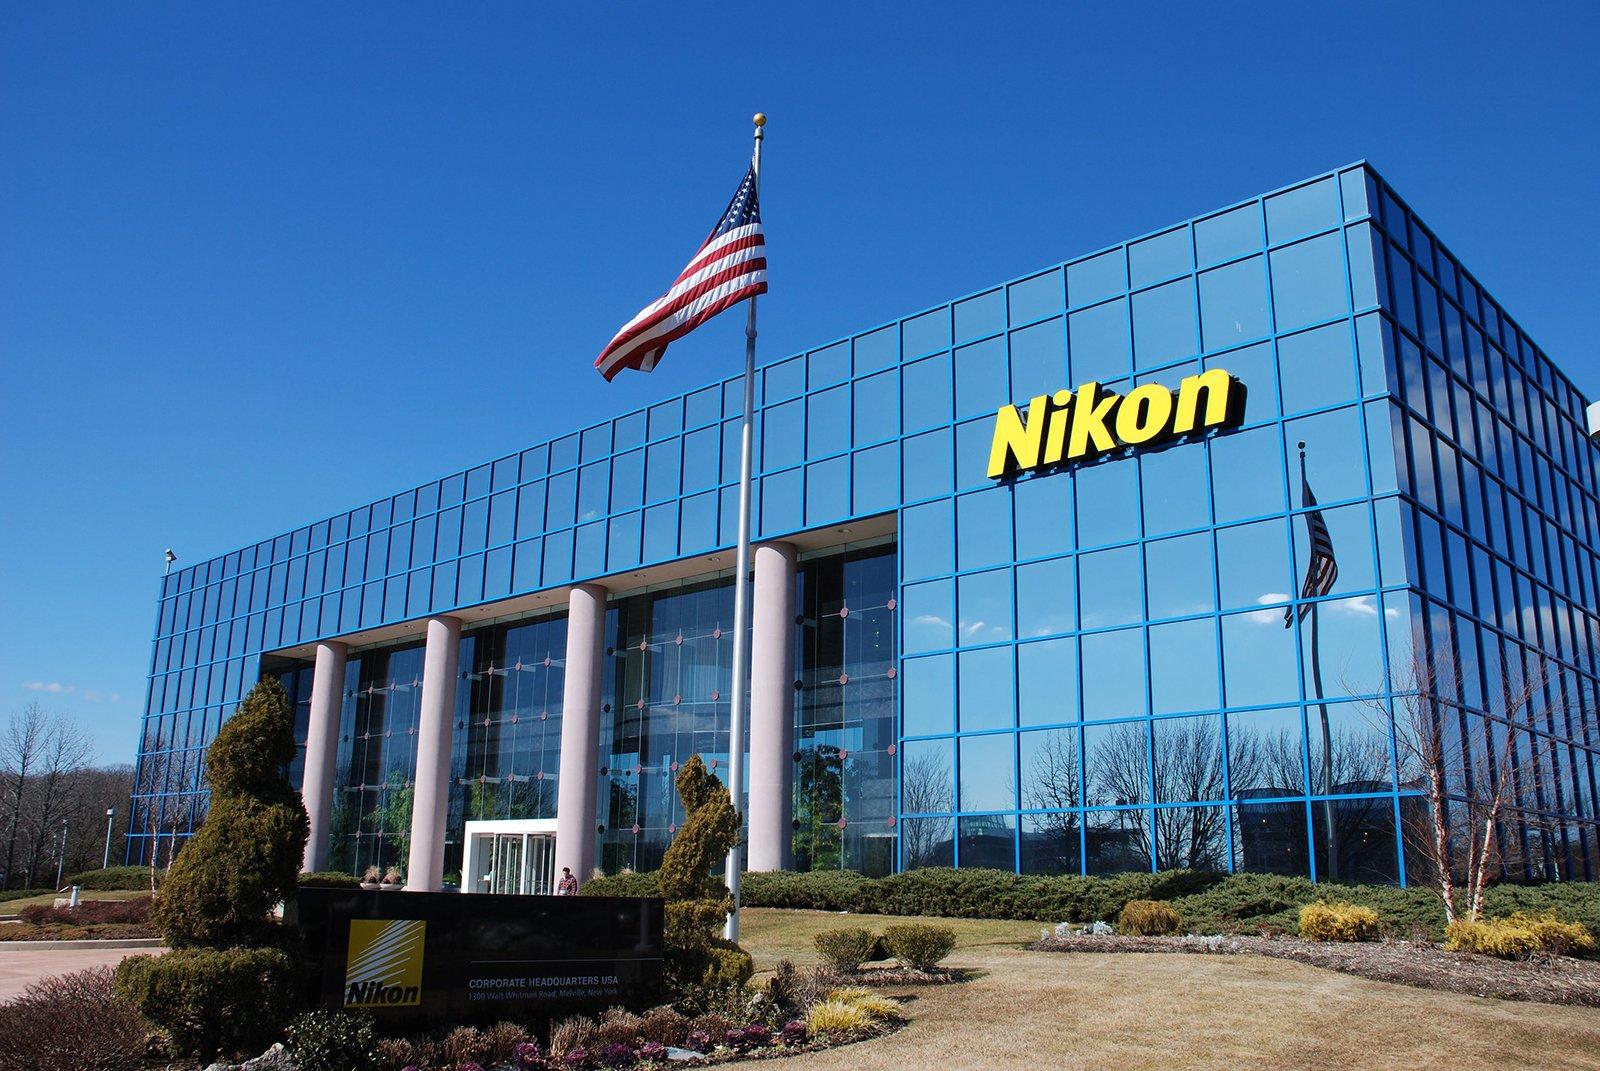 Nikon Warns of 'Extraordinary Losses' Due to COVID-19